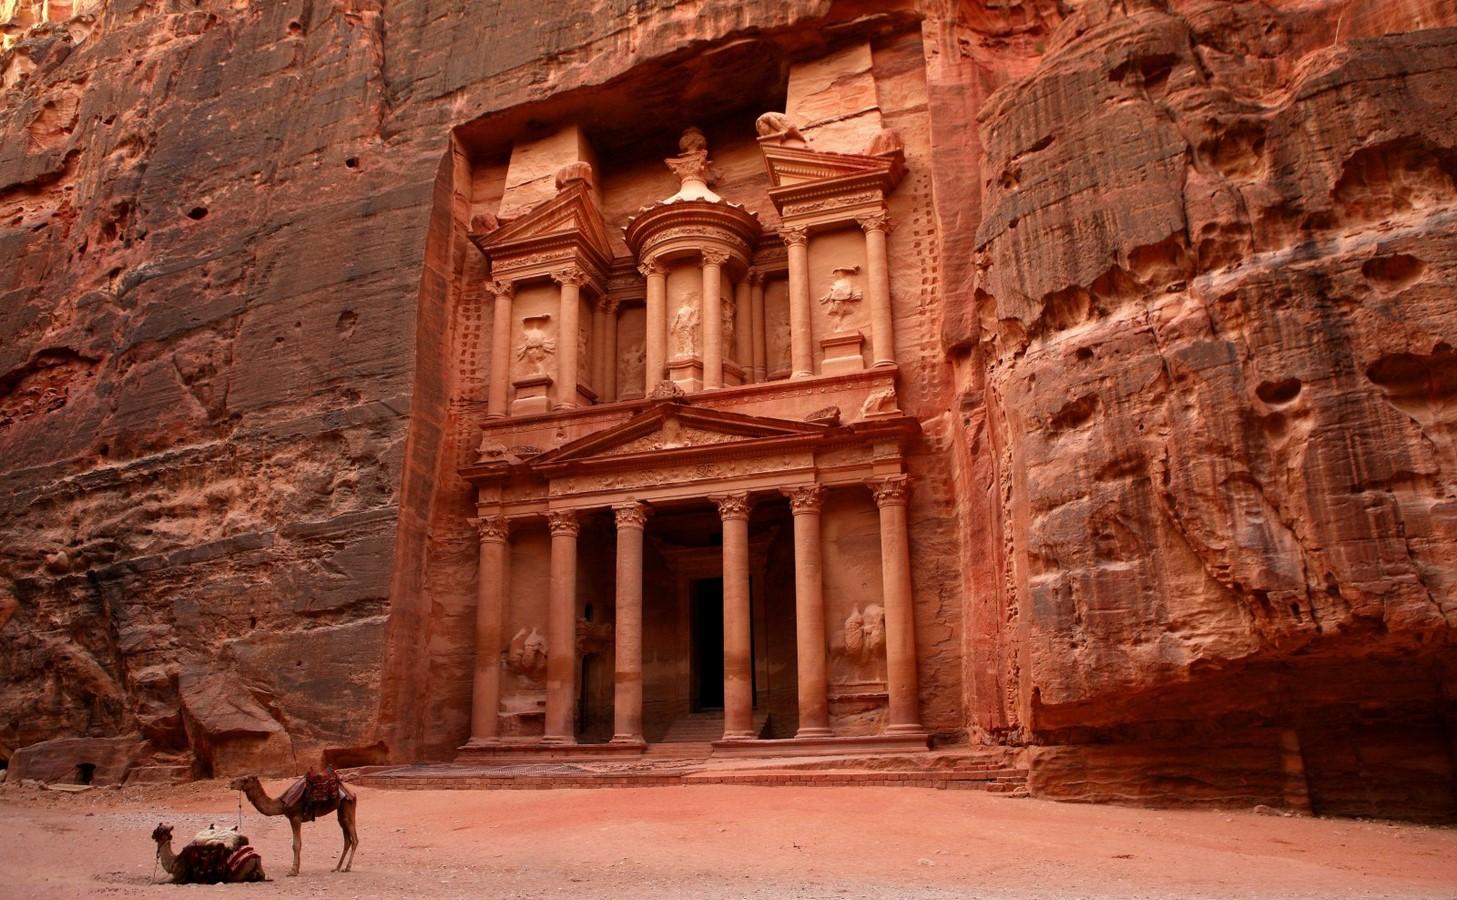 Historicity in Architecture - Petra, Jordan - Sheet1